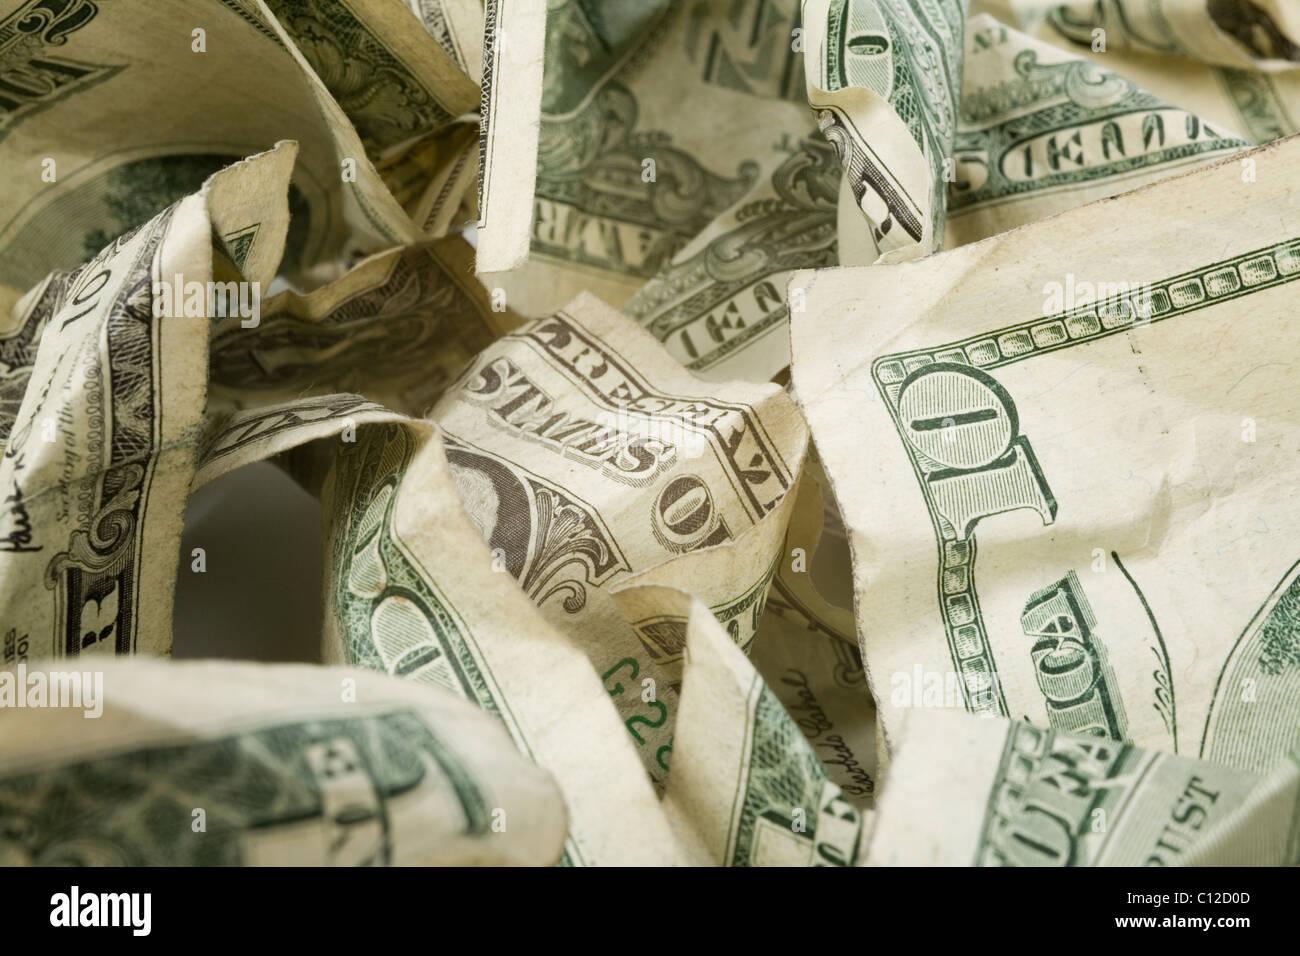 us dollars close up shot, financial concept - Stock Image